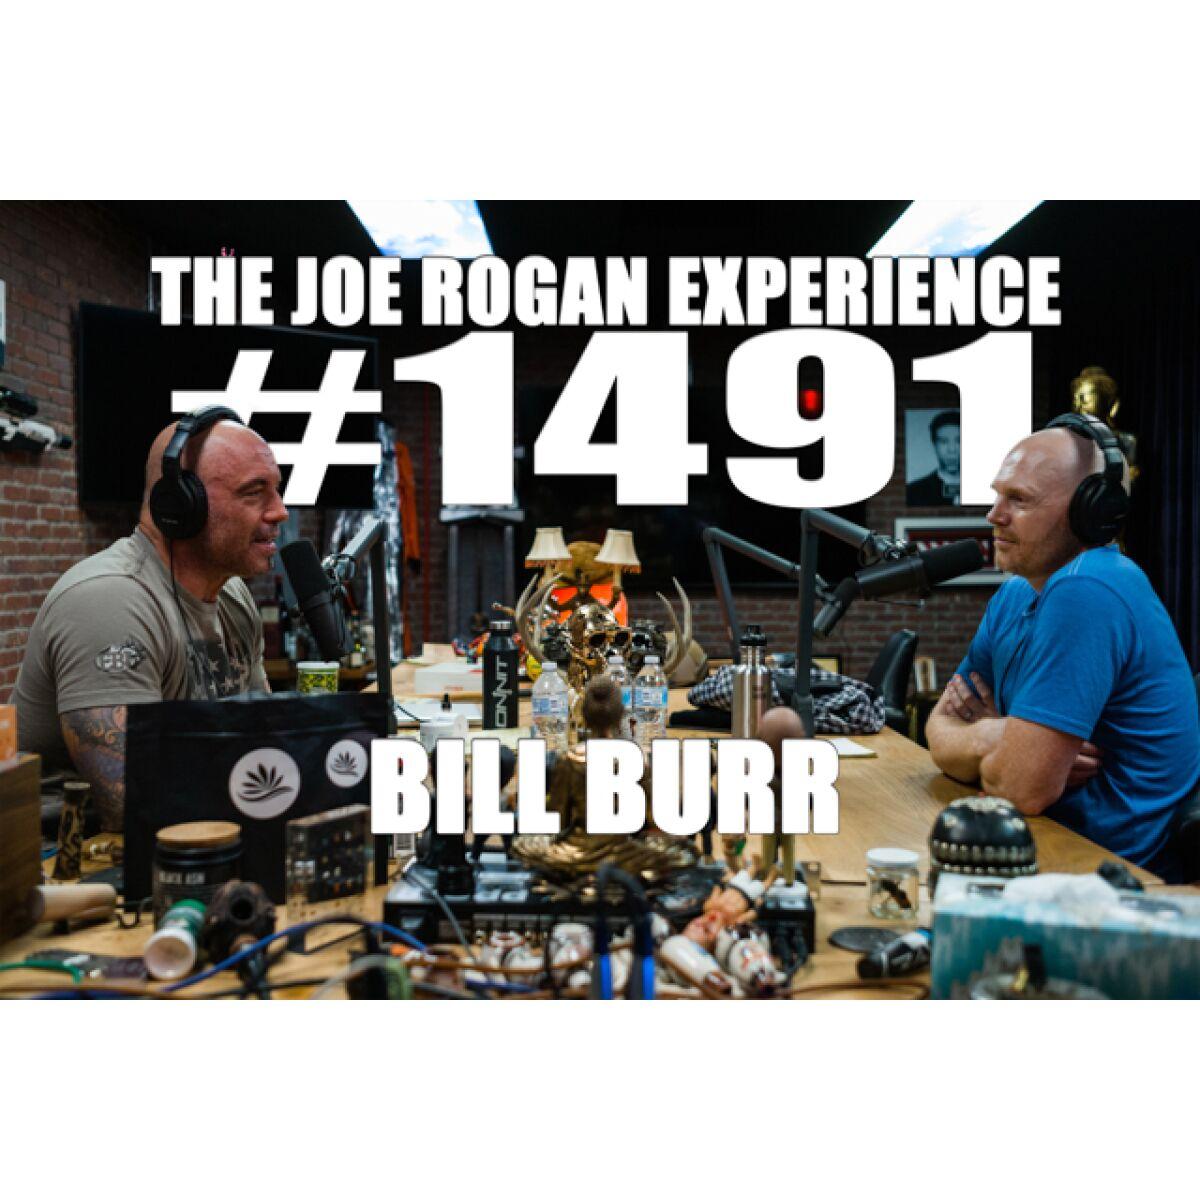 ️ #1491 - Bill Burr - The Joe Rogan Experience - Podcast